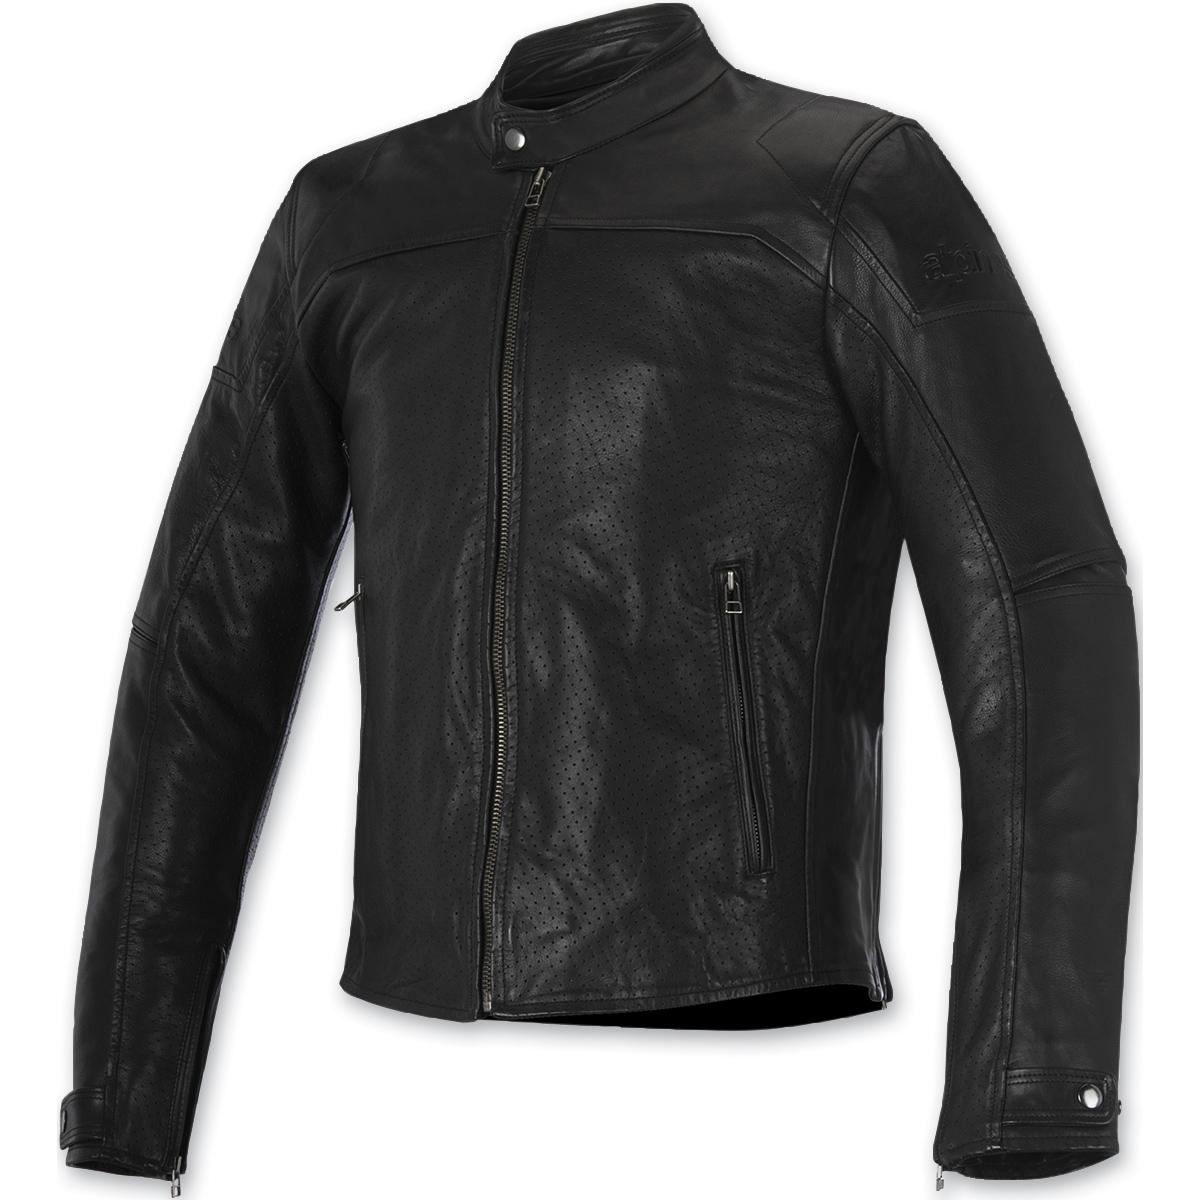 Alpinestars Men's Brera Airflow Black Leather Jacket